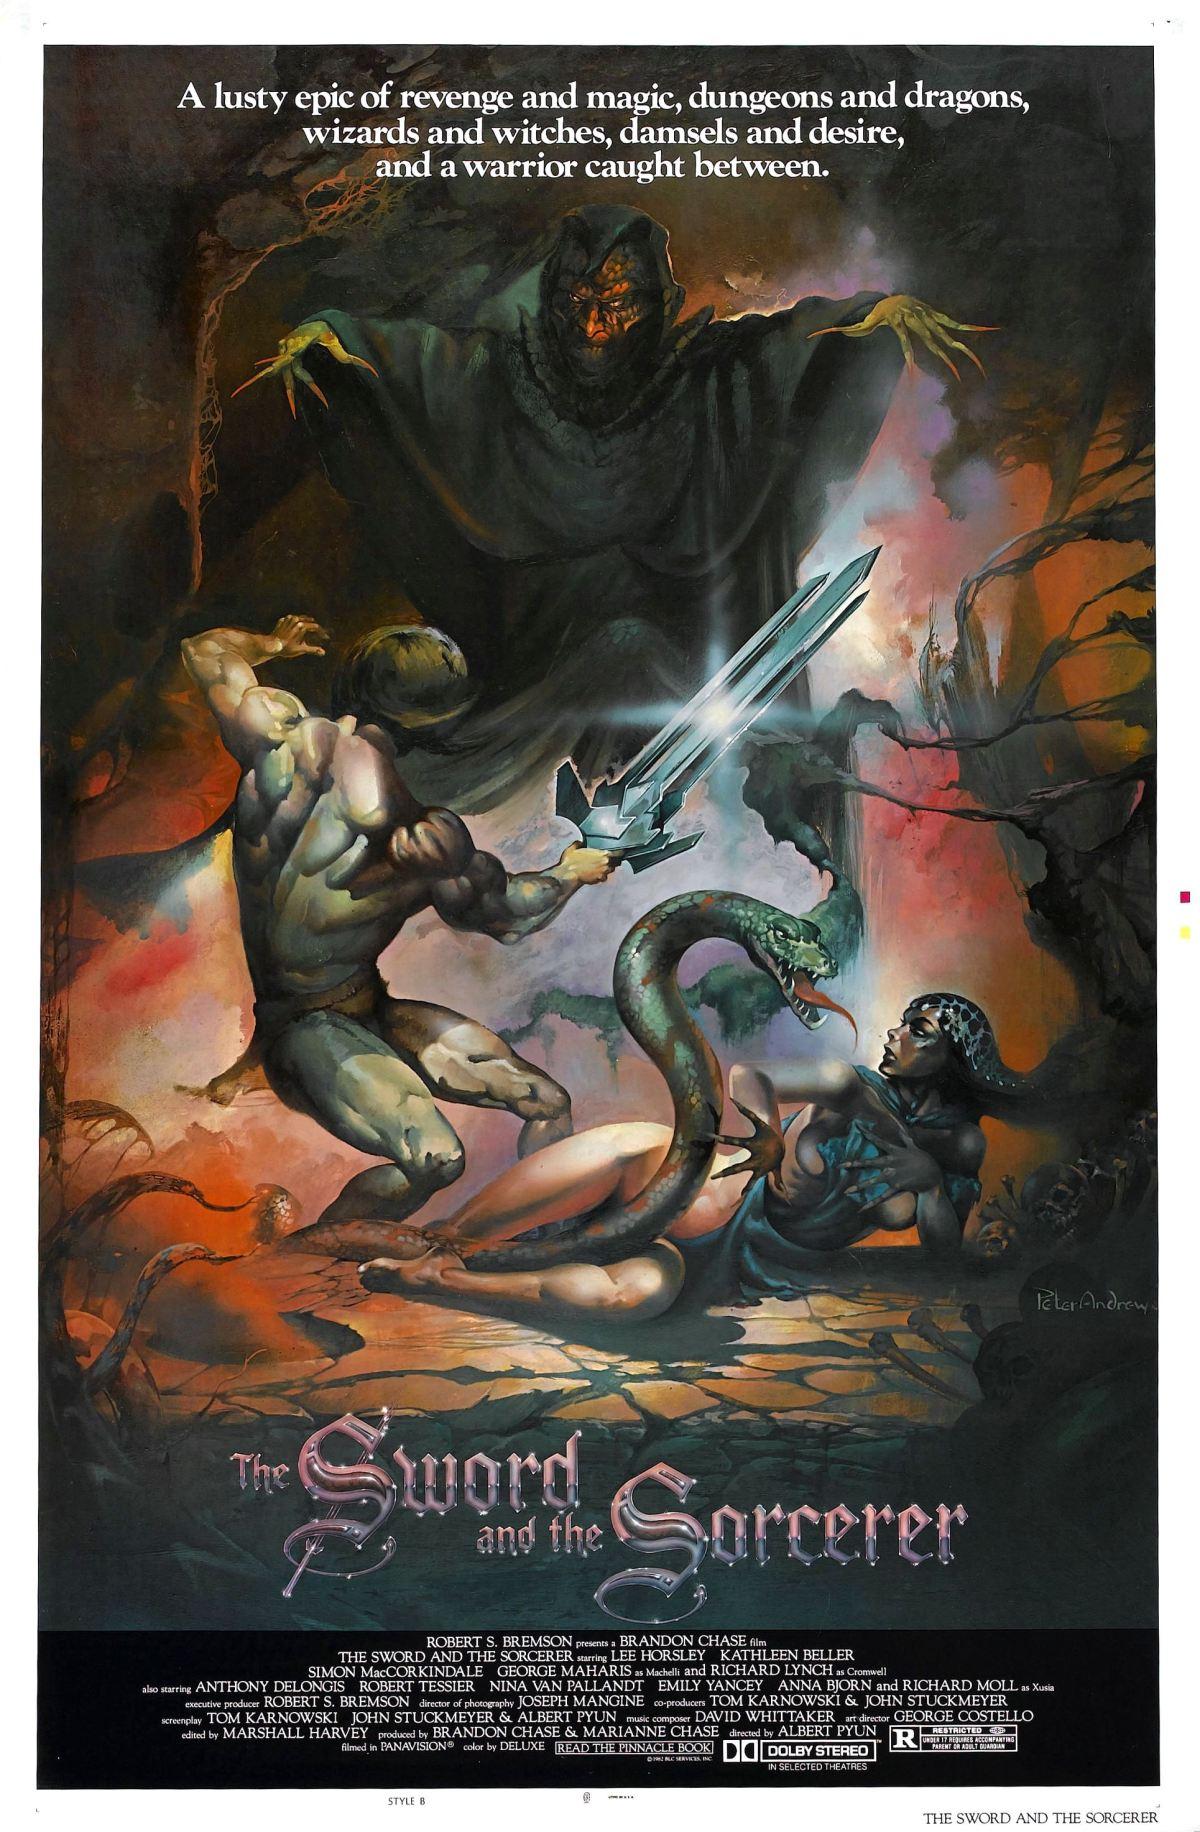 http://esbilla.files.wordpress.com/2012/06/sword_and_sorcerer_poster_01.jpg?w=1200